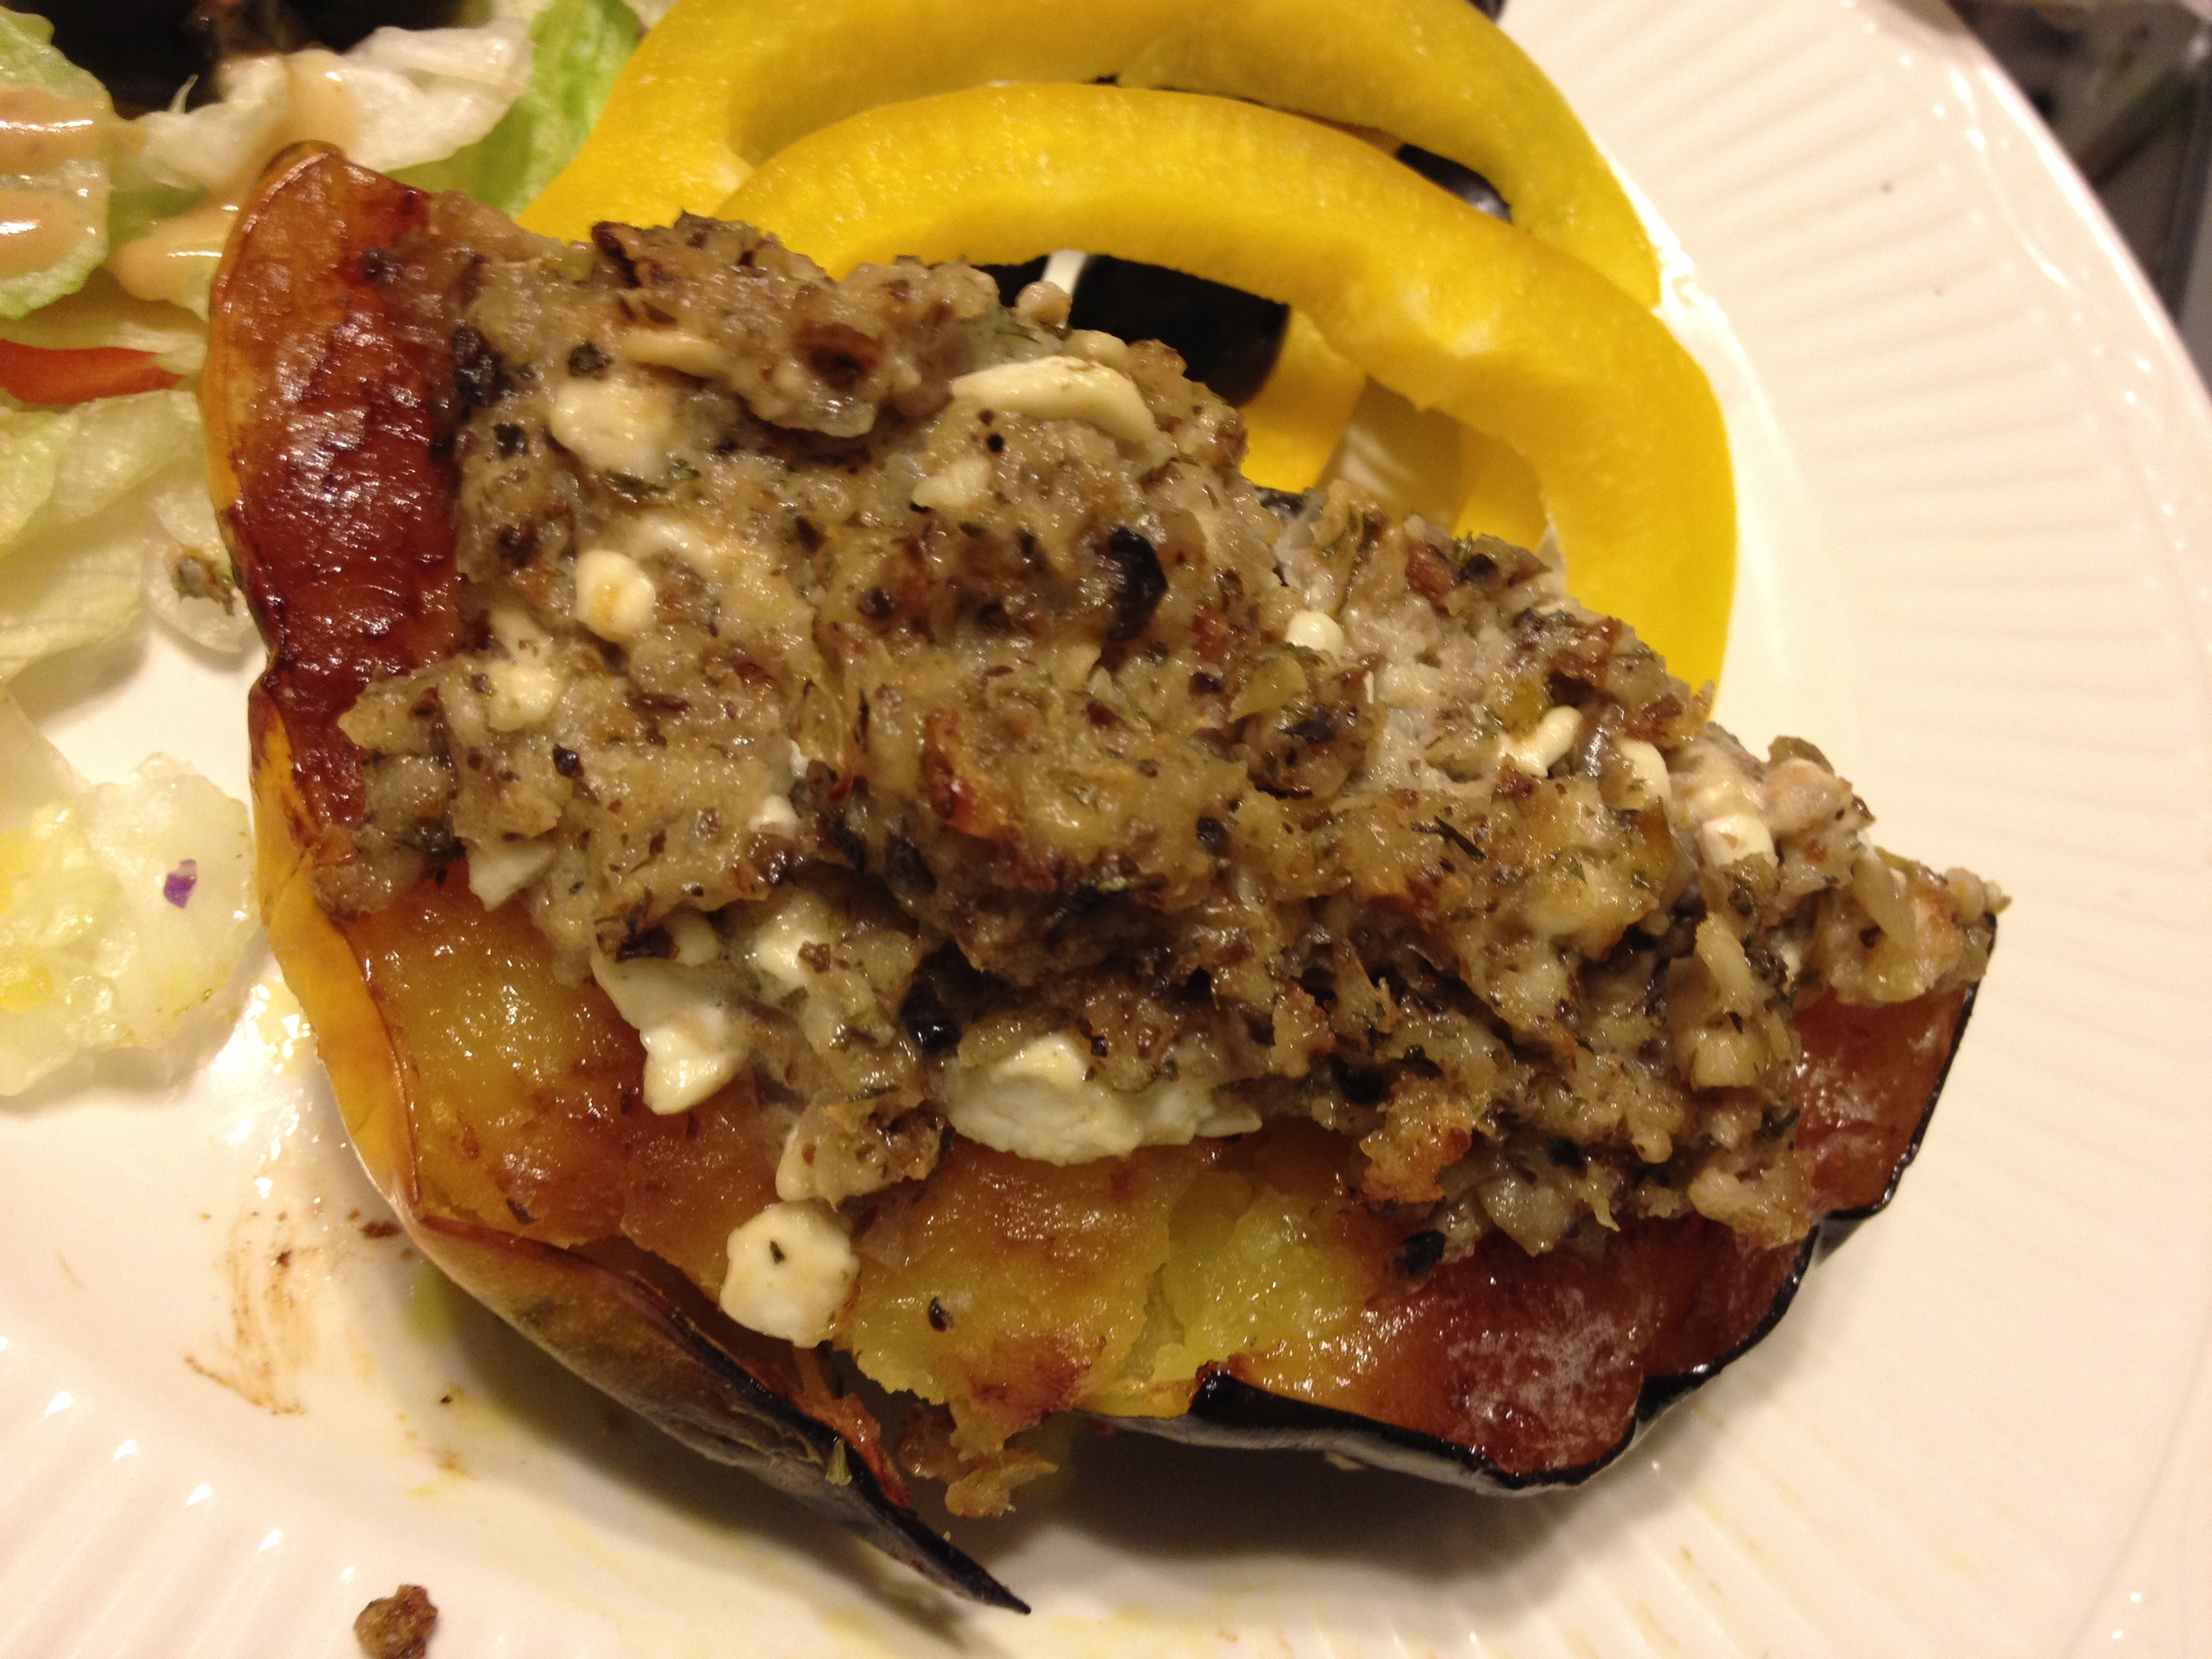 Mushroom-Cheese Stuffed Squash